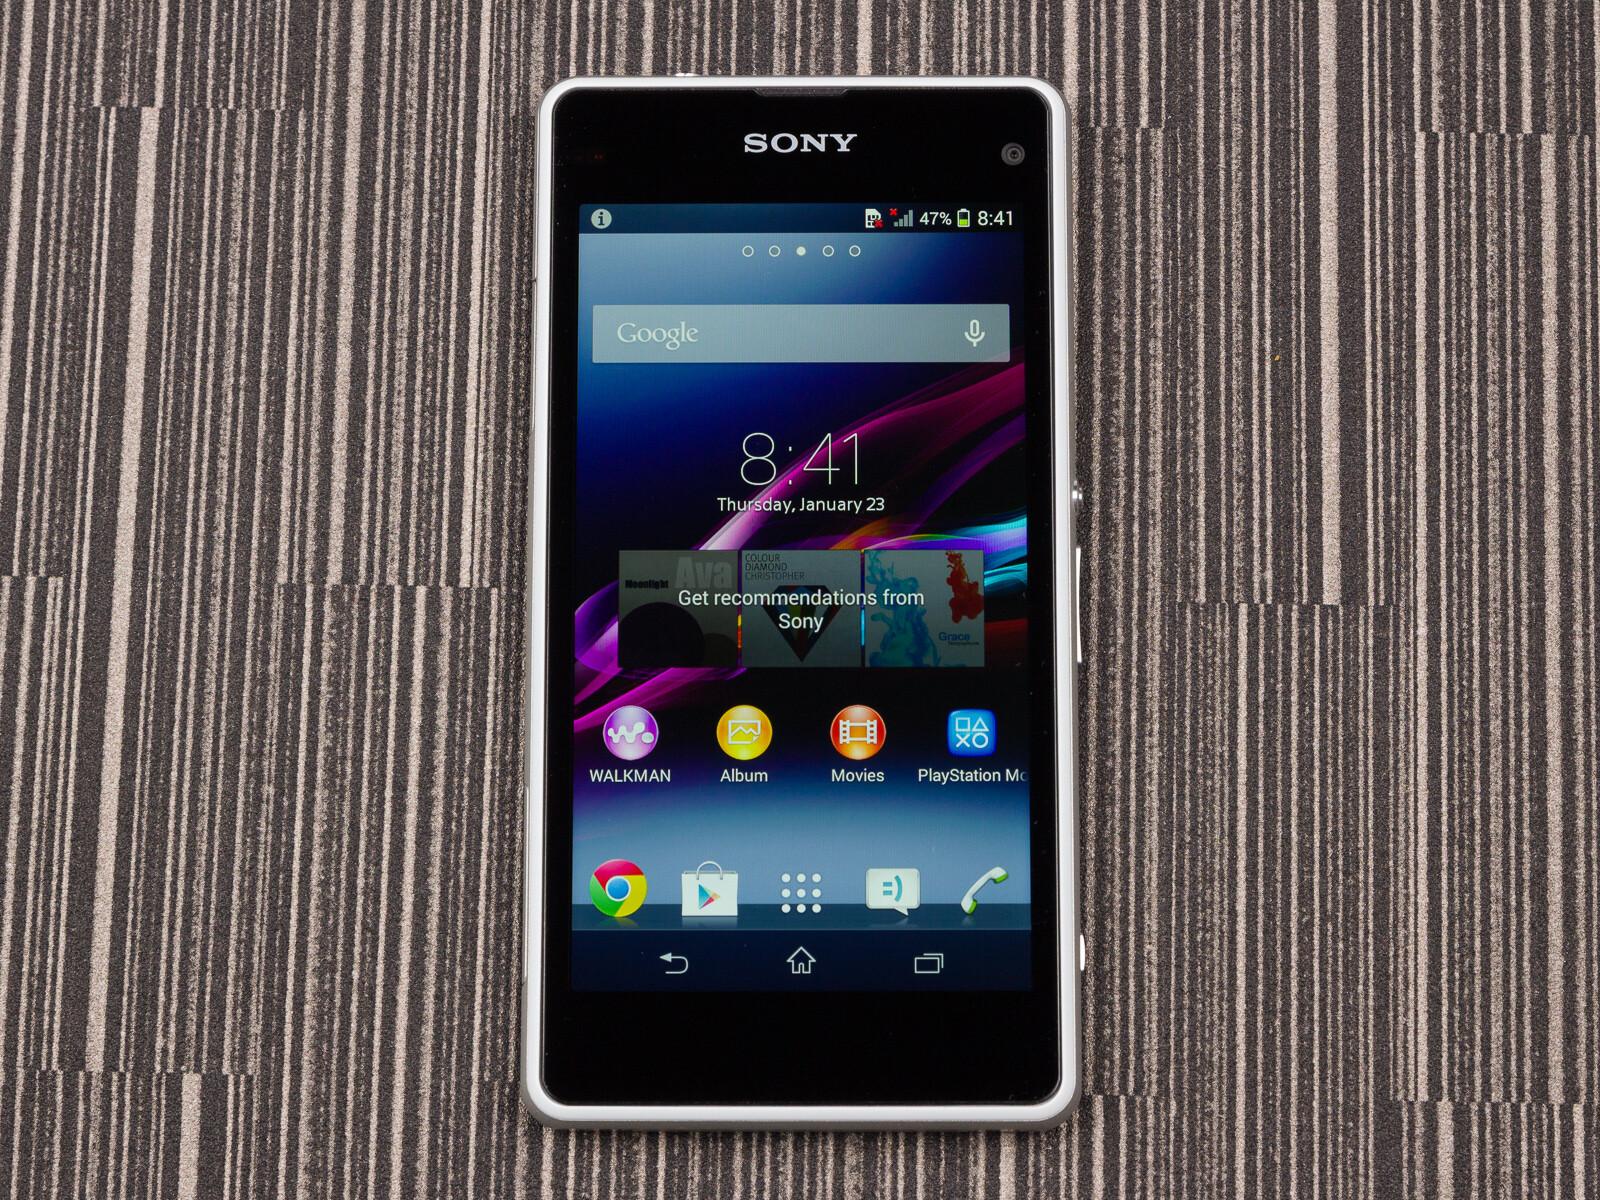 Sony Xperia Z1 pact 5